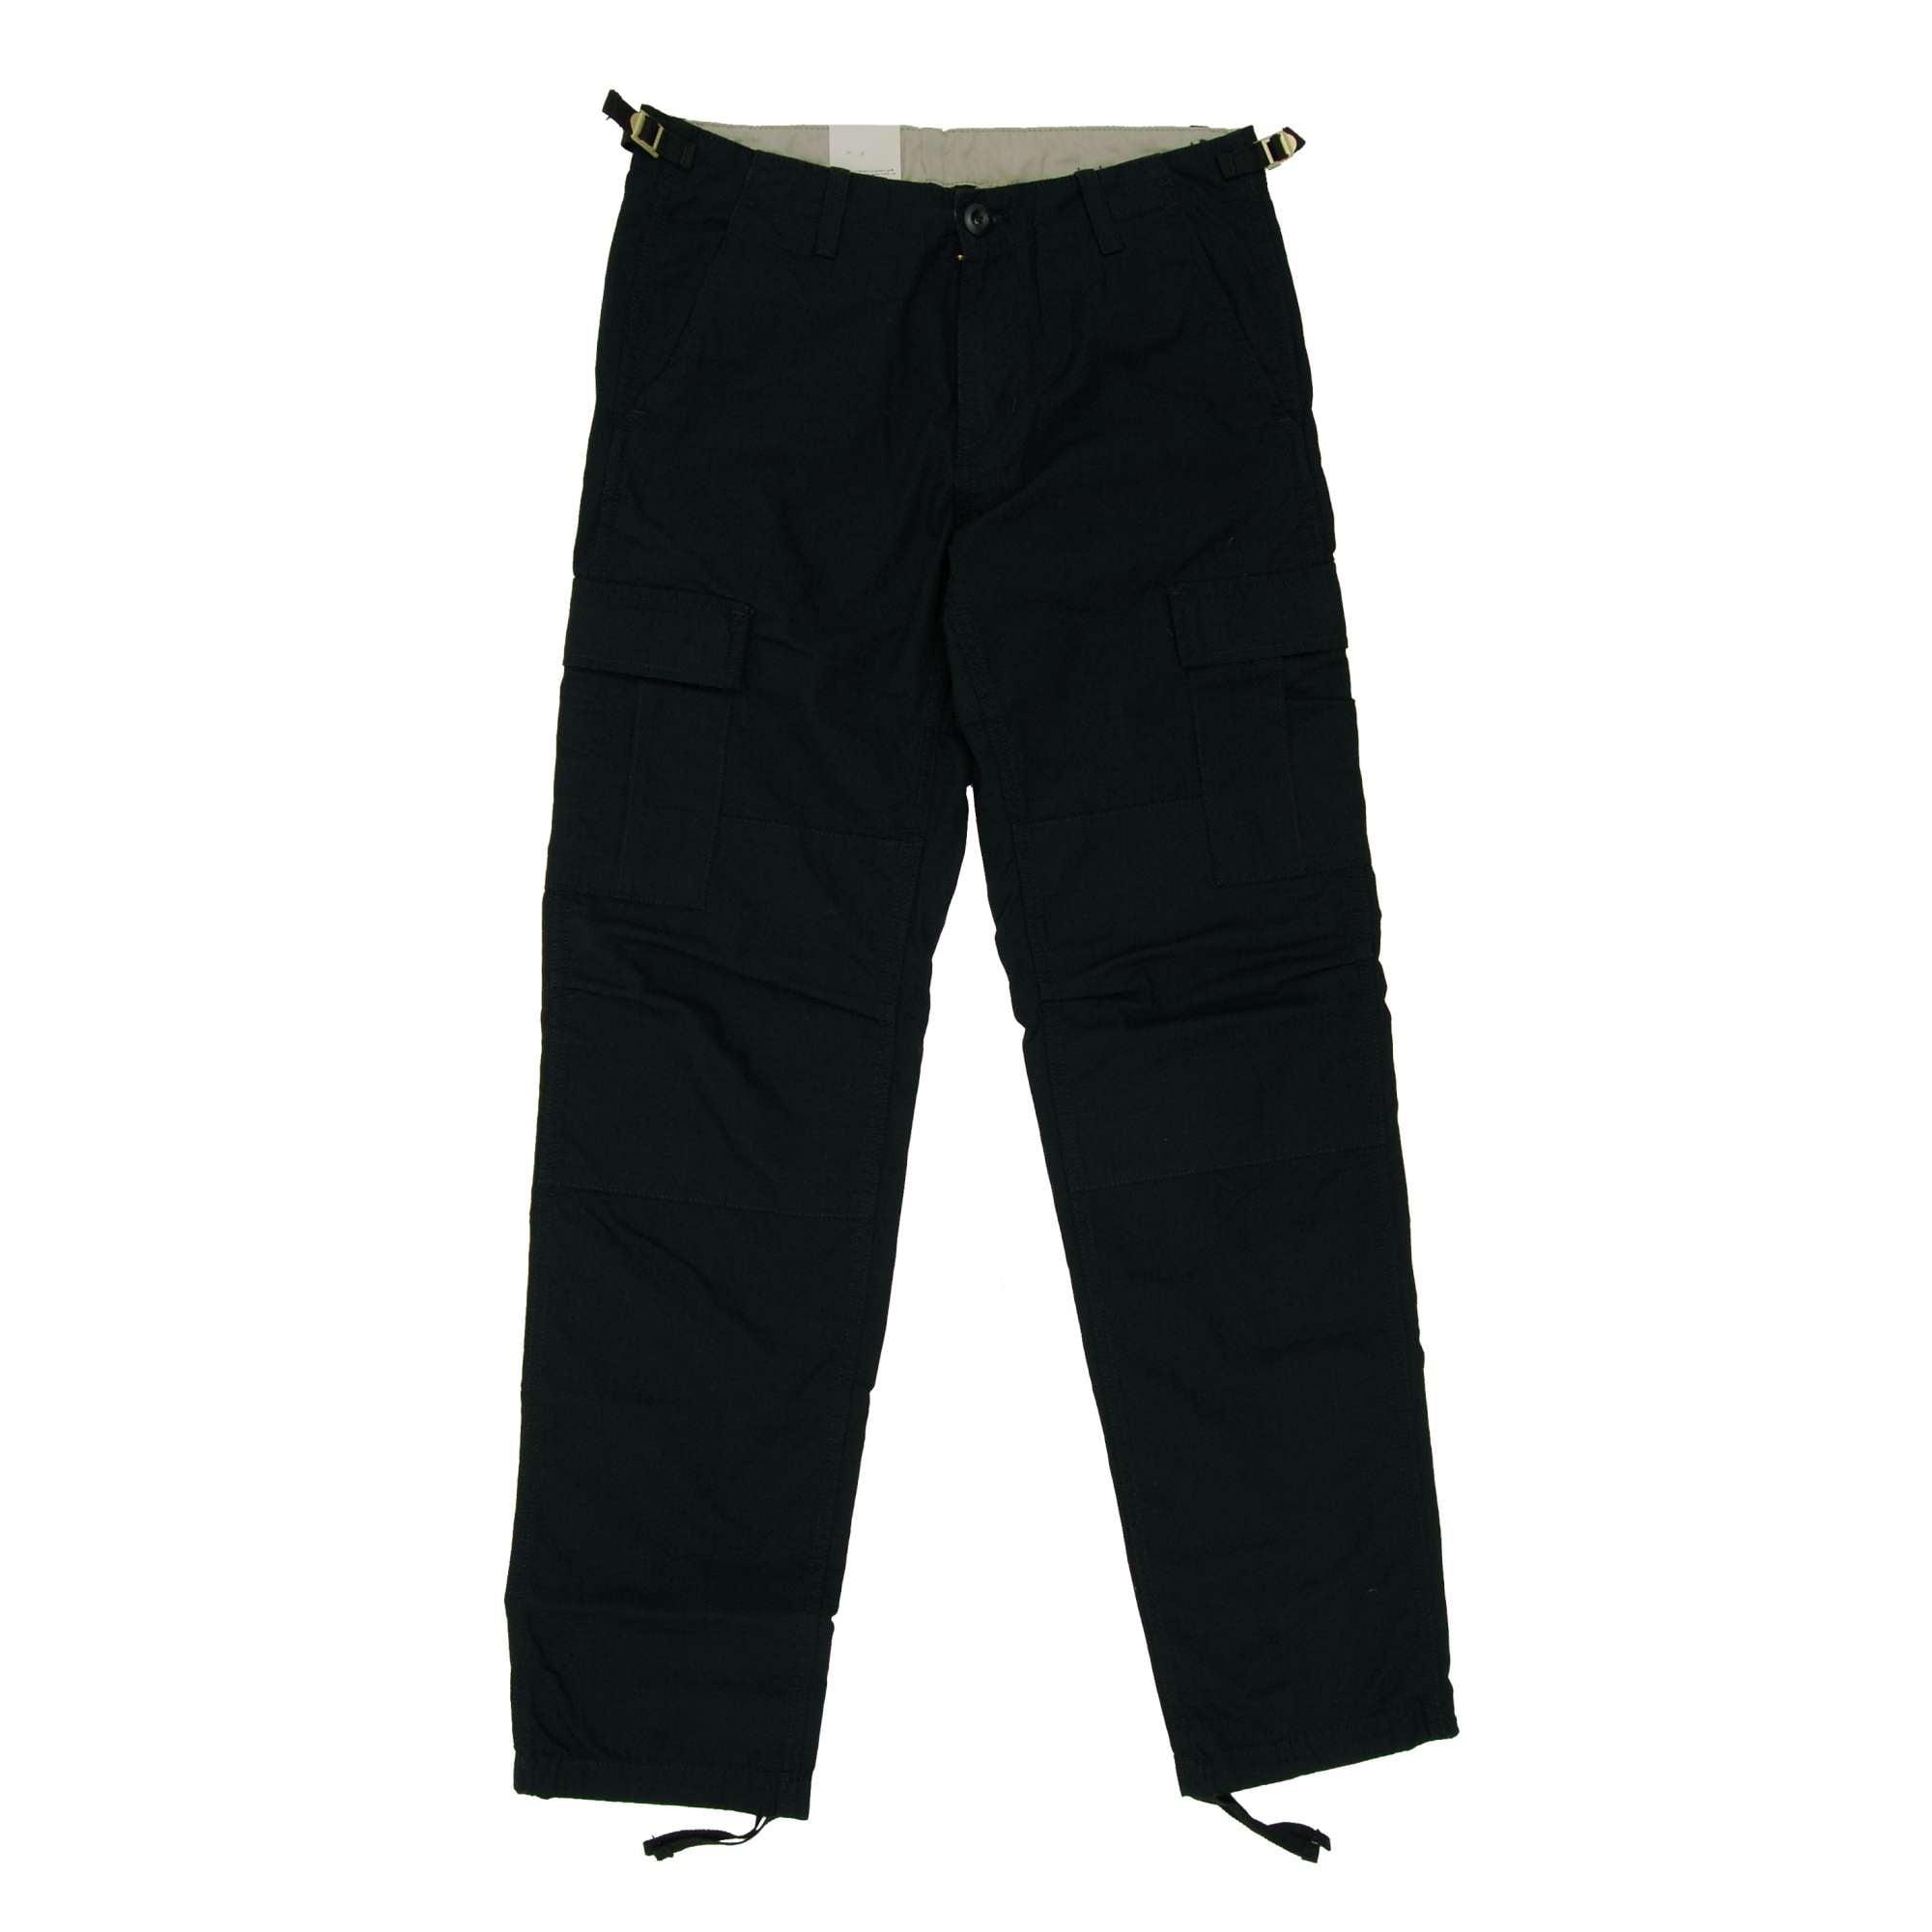 carhartt aviation pant columbia black mens pants and. Black Bedroom Furniture Sets. Home Design Ideas